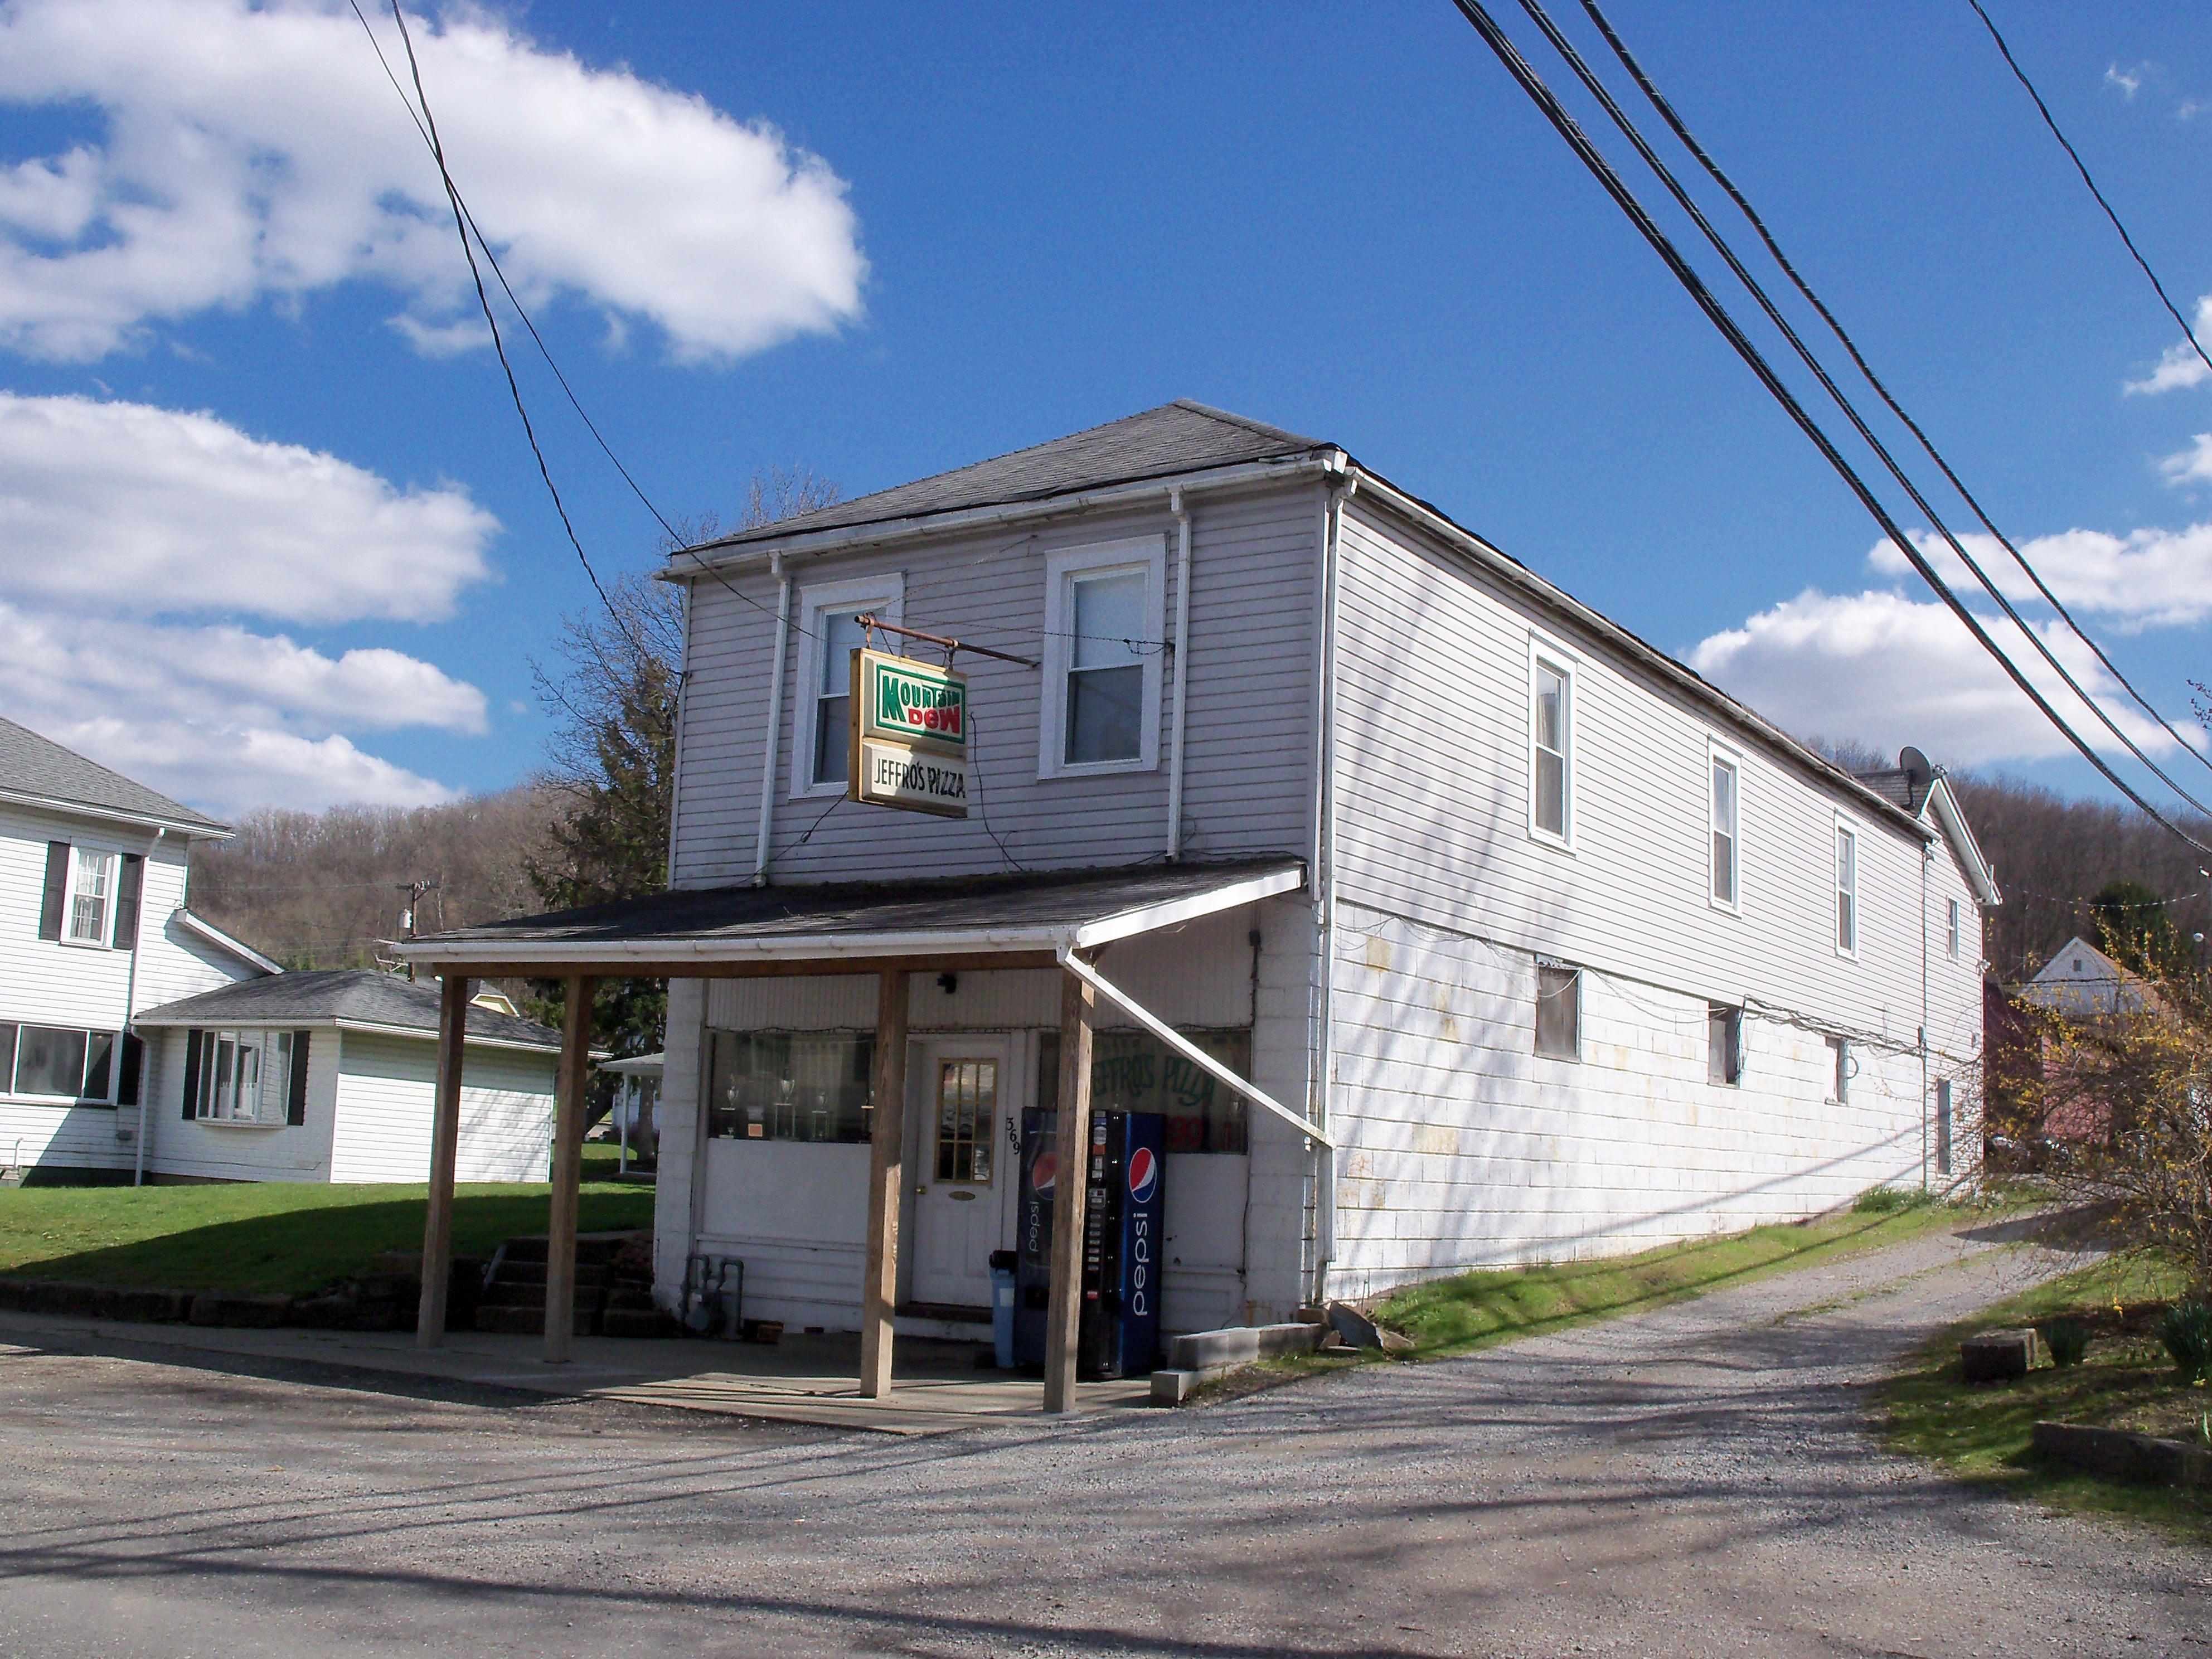 Ohio jefferson county bergholz - File Jeffro S Pizza Bergholz Ohio